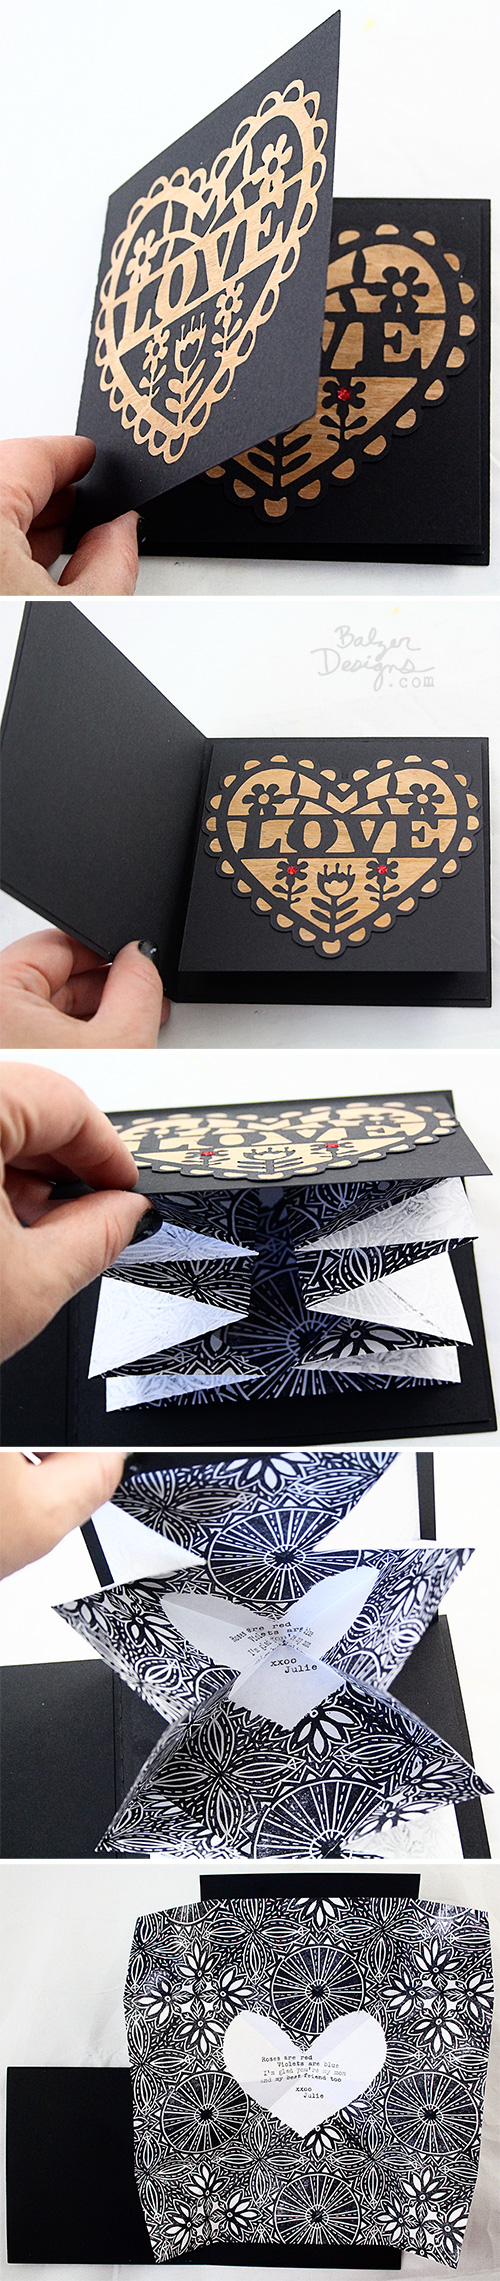 CardOpening-wm